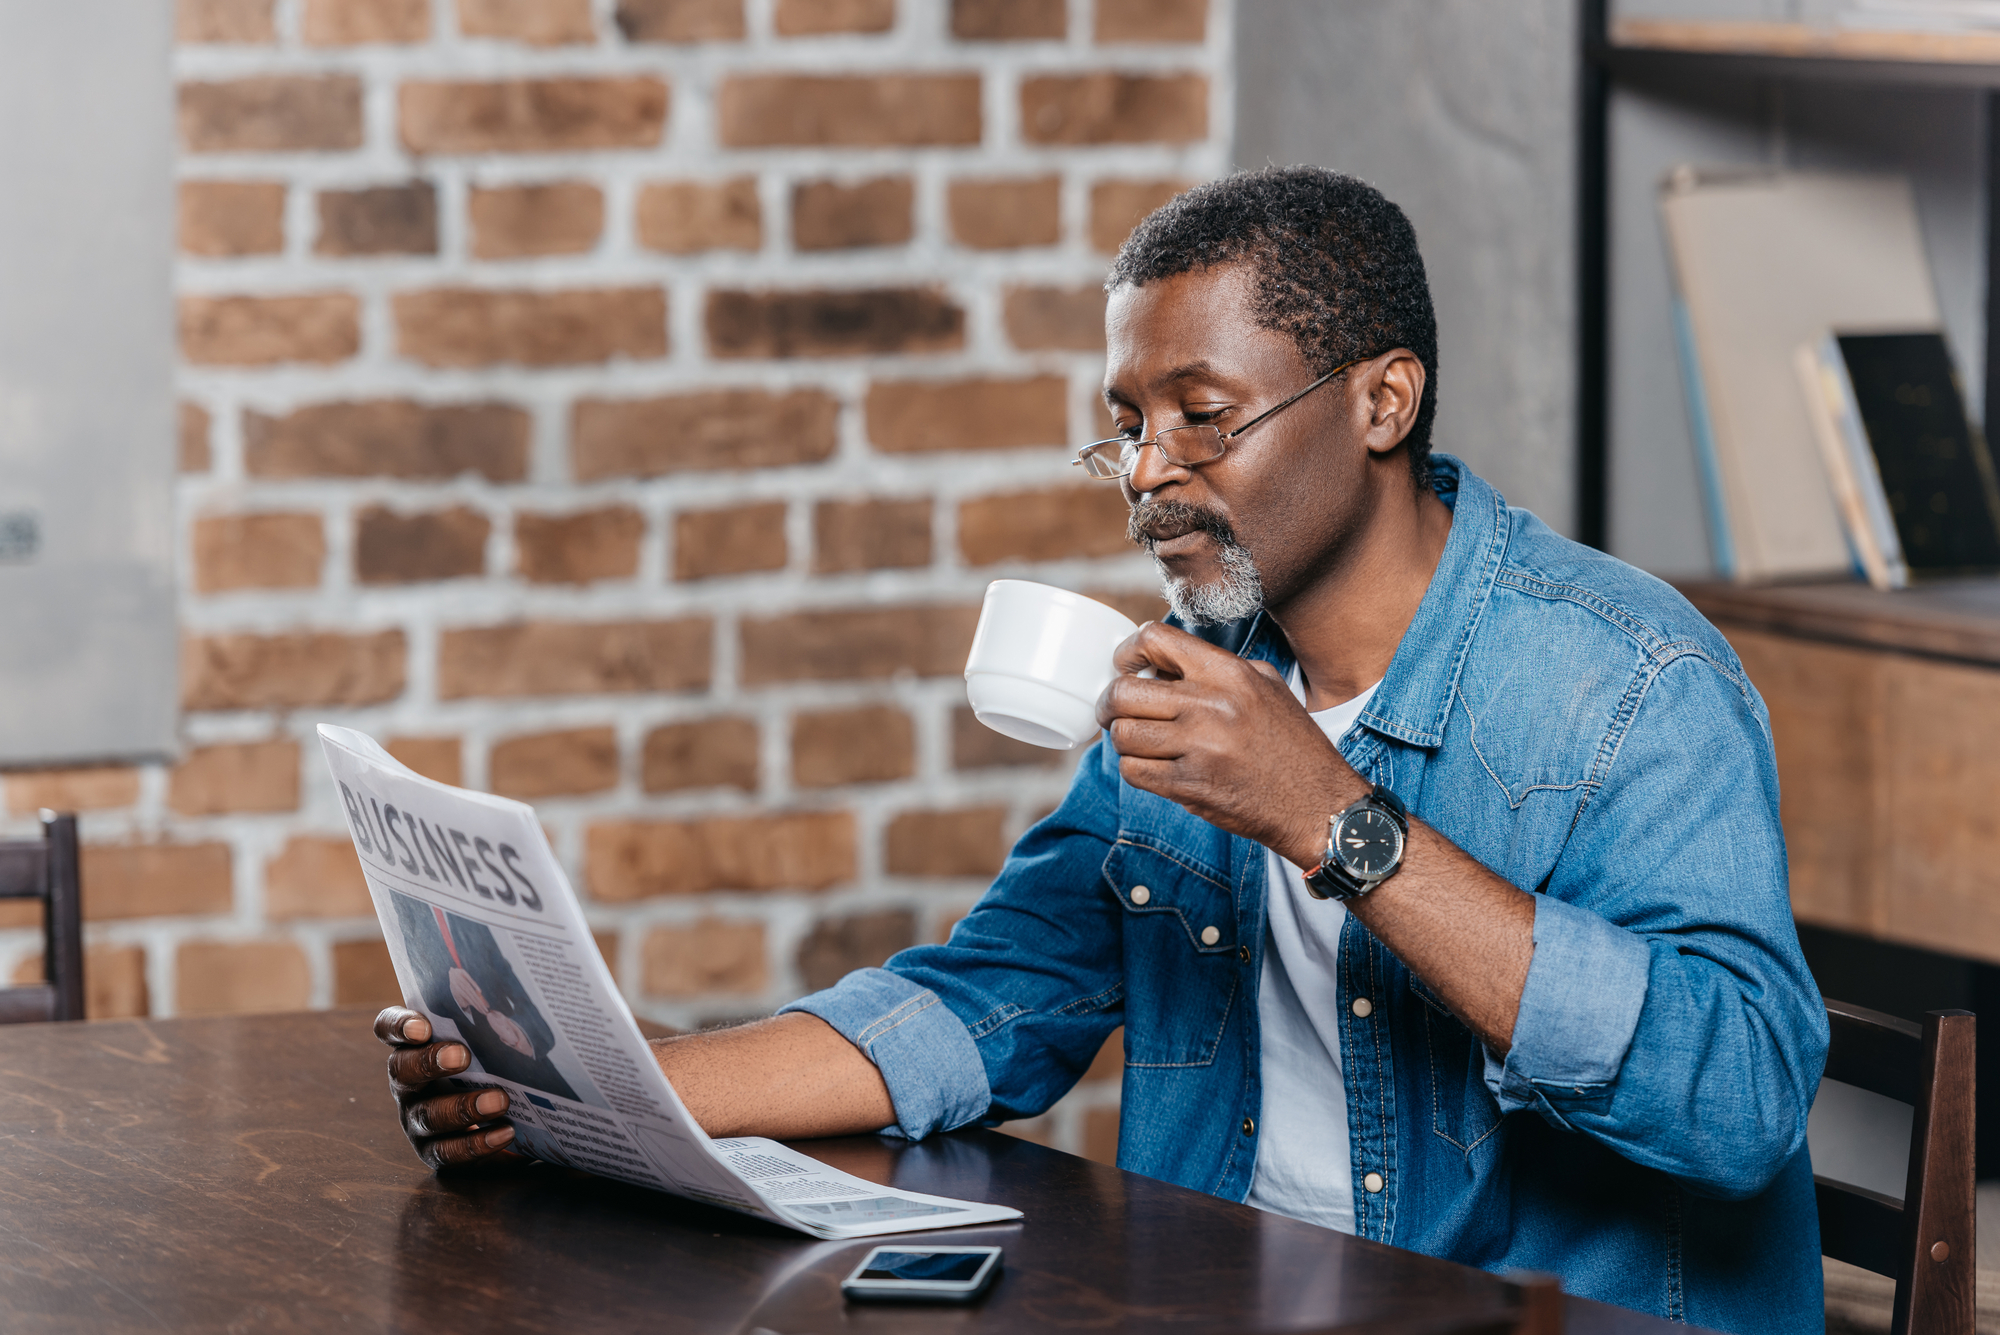 African american man reading newspaper